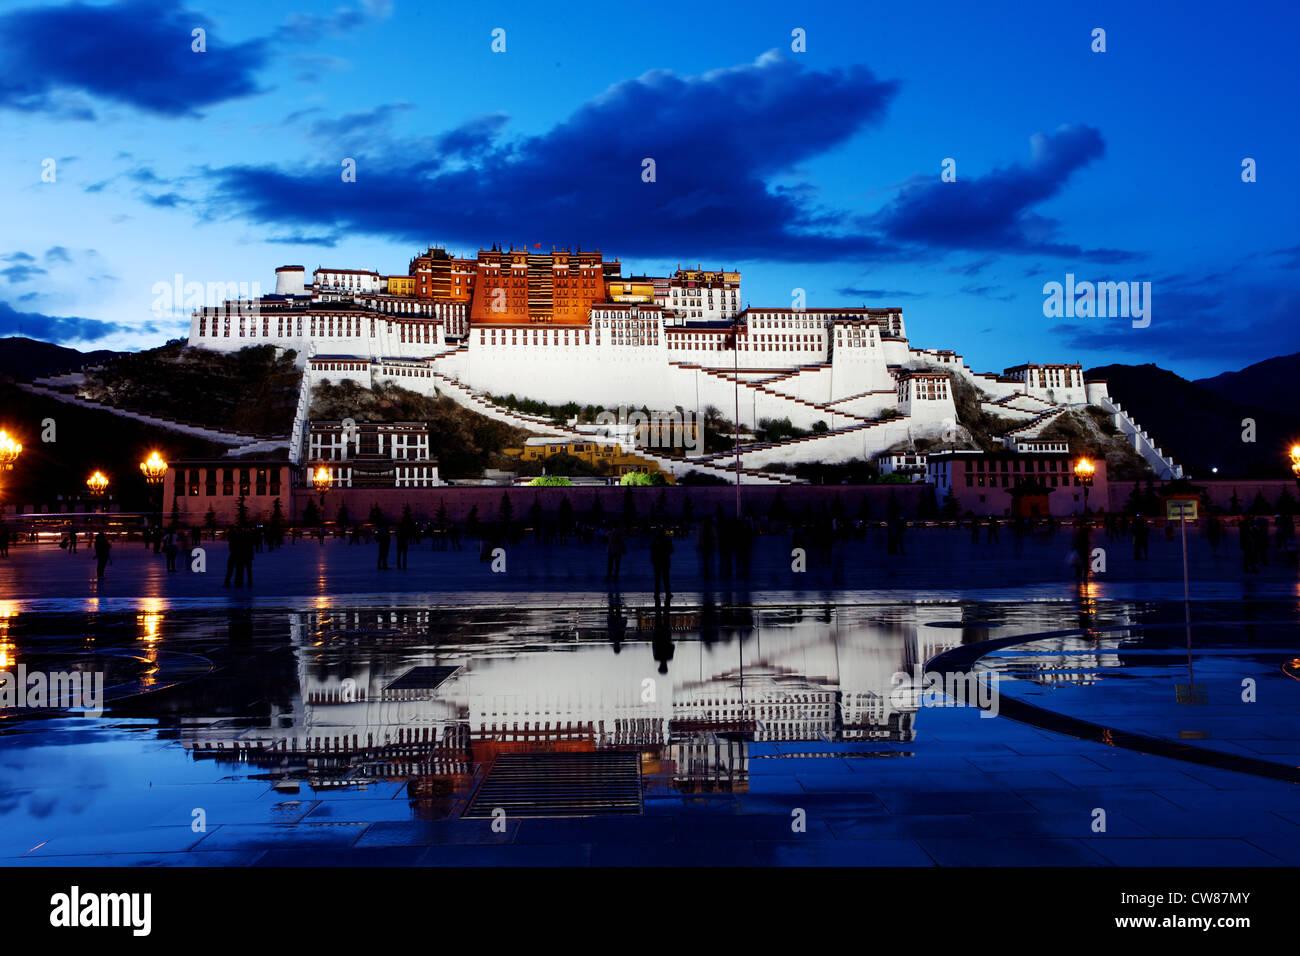 The Potala Palace in Lhasa, Tibet - Stock Image